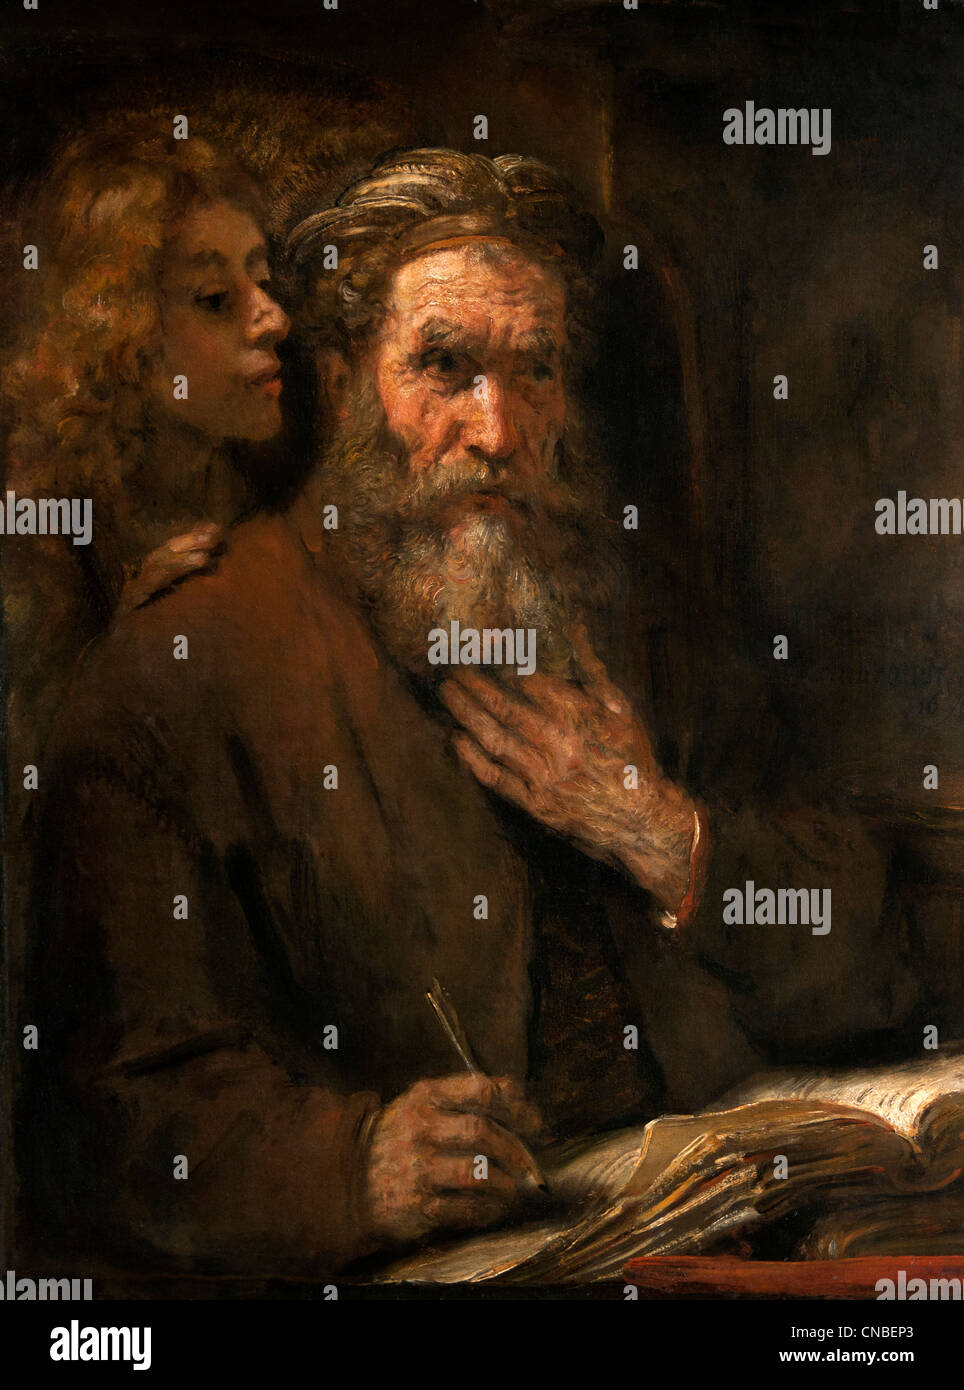 Rembrandt Harmensz. van Rijn Dutch 1606–1669) Saint MATTHEW and the Angel 1661 Netherlands Stock Photo